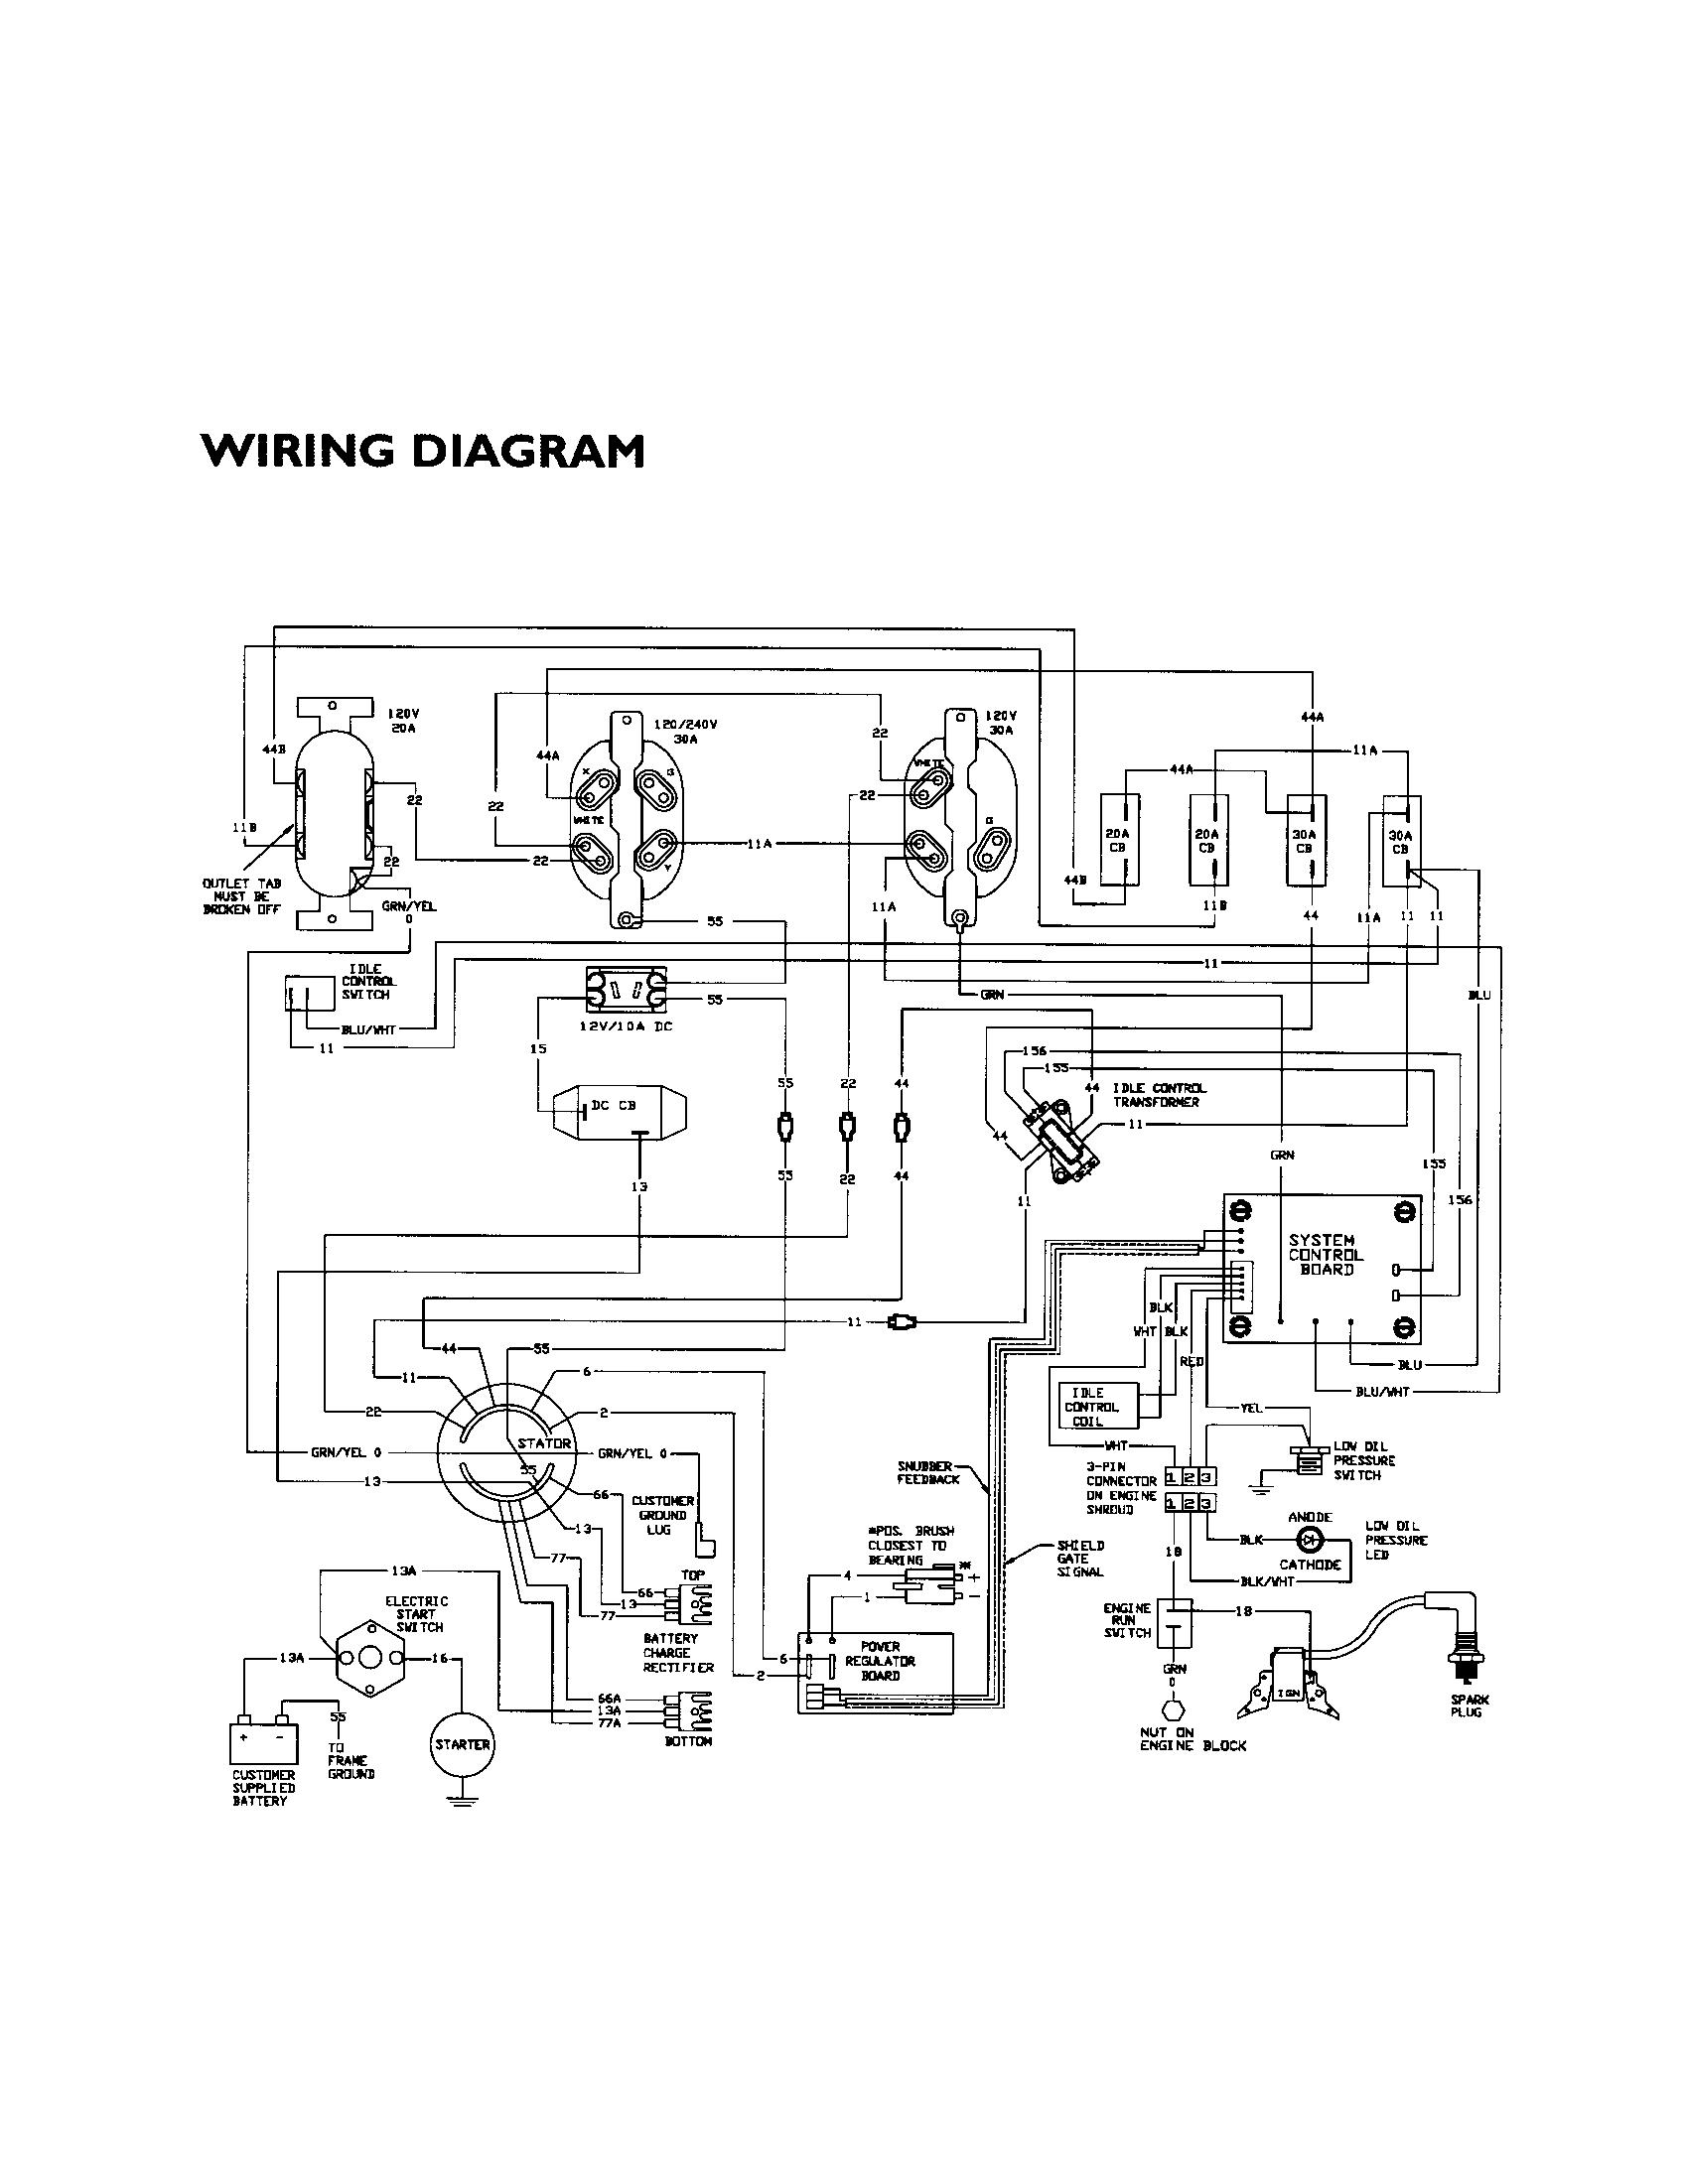 Wiring Diagram Generac Generator